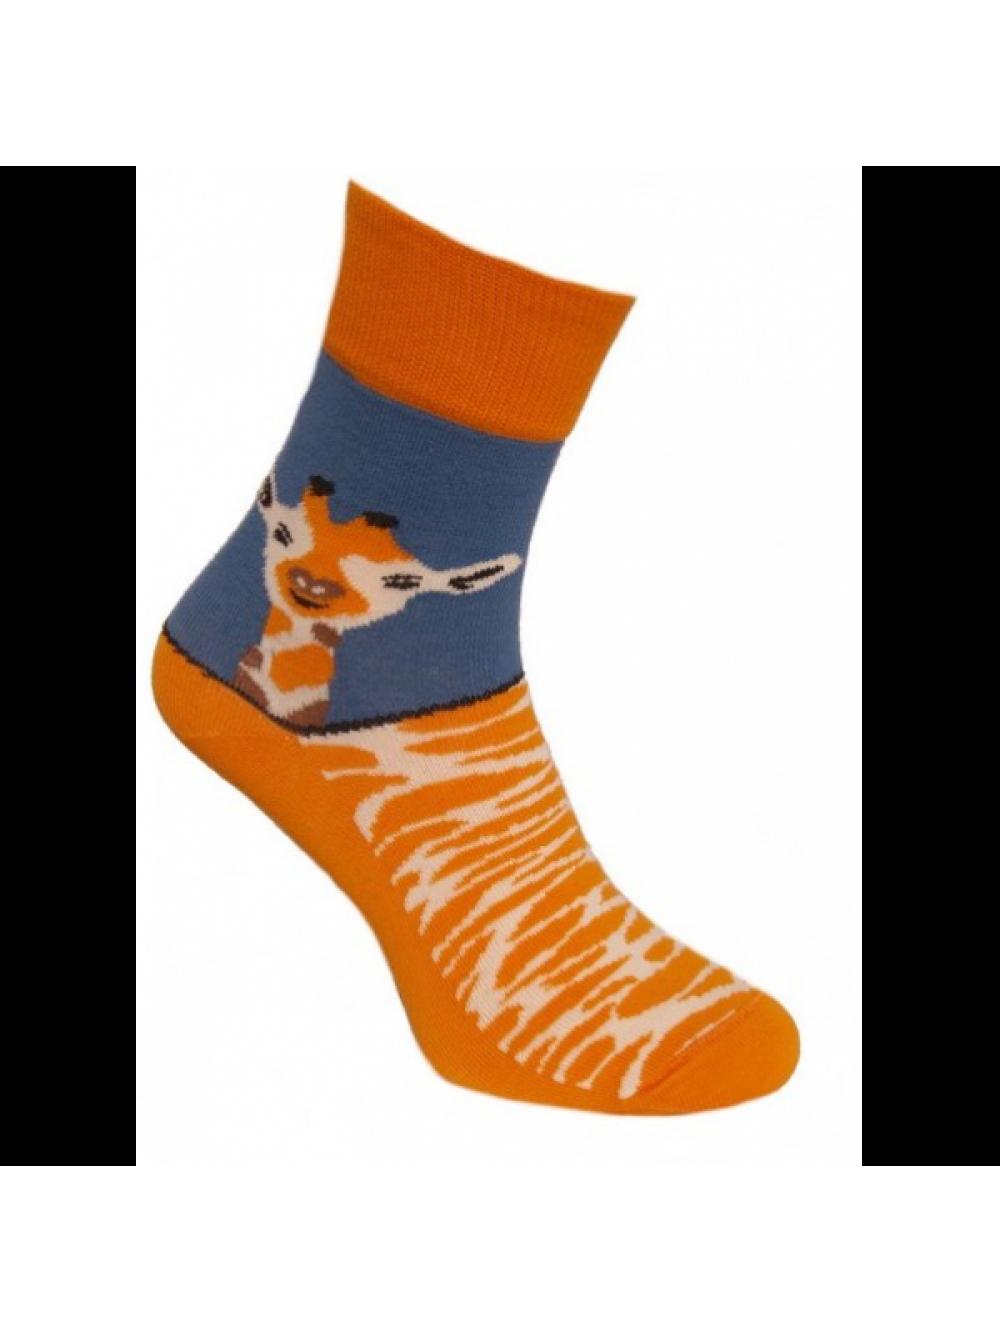 75d9e377a Ponožky Žirafa Foxysoxy